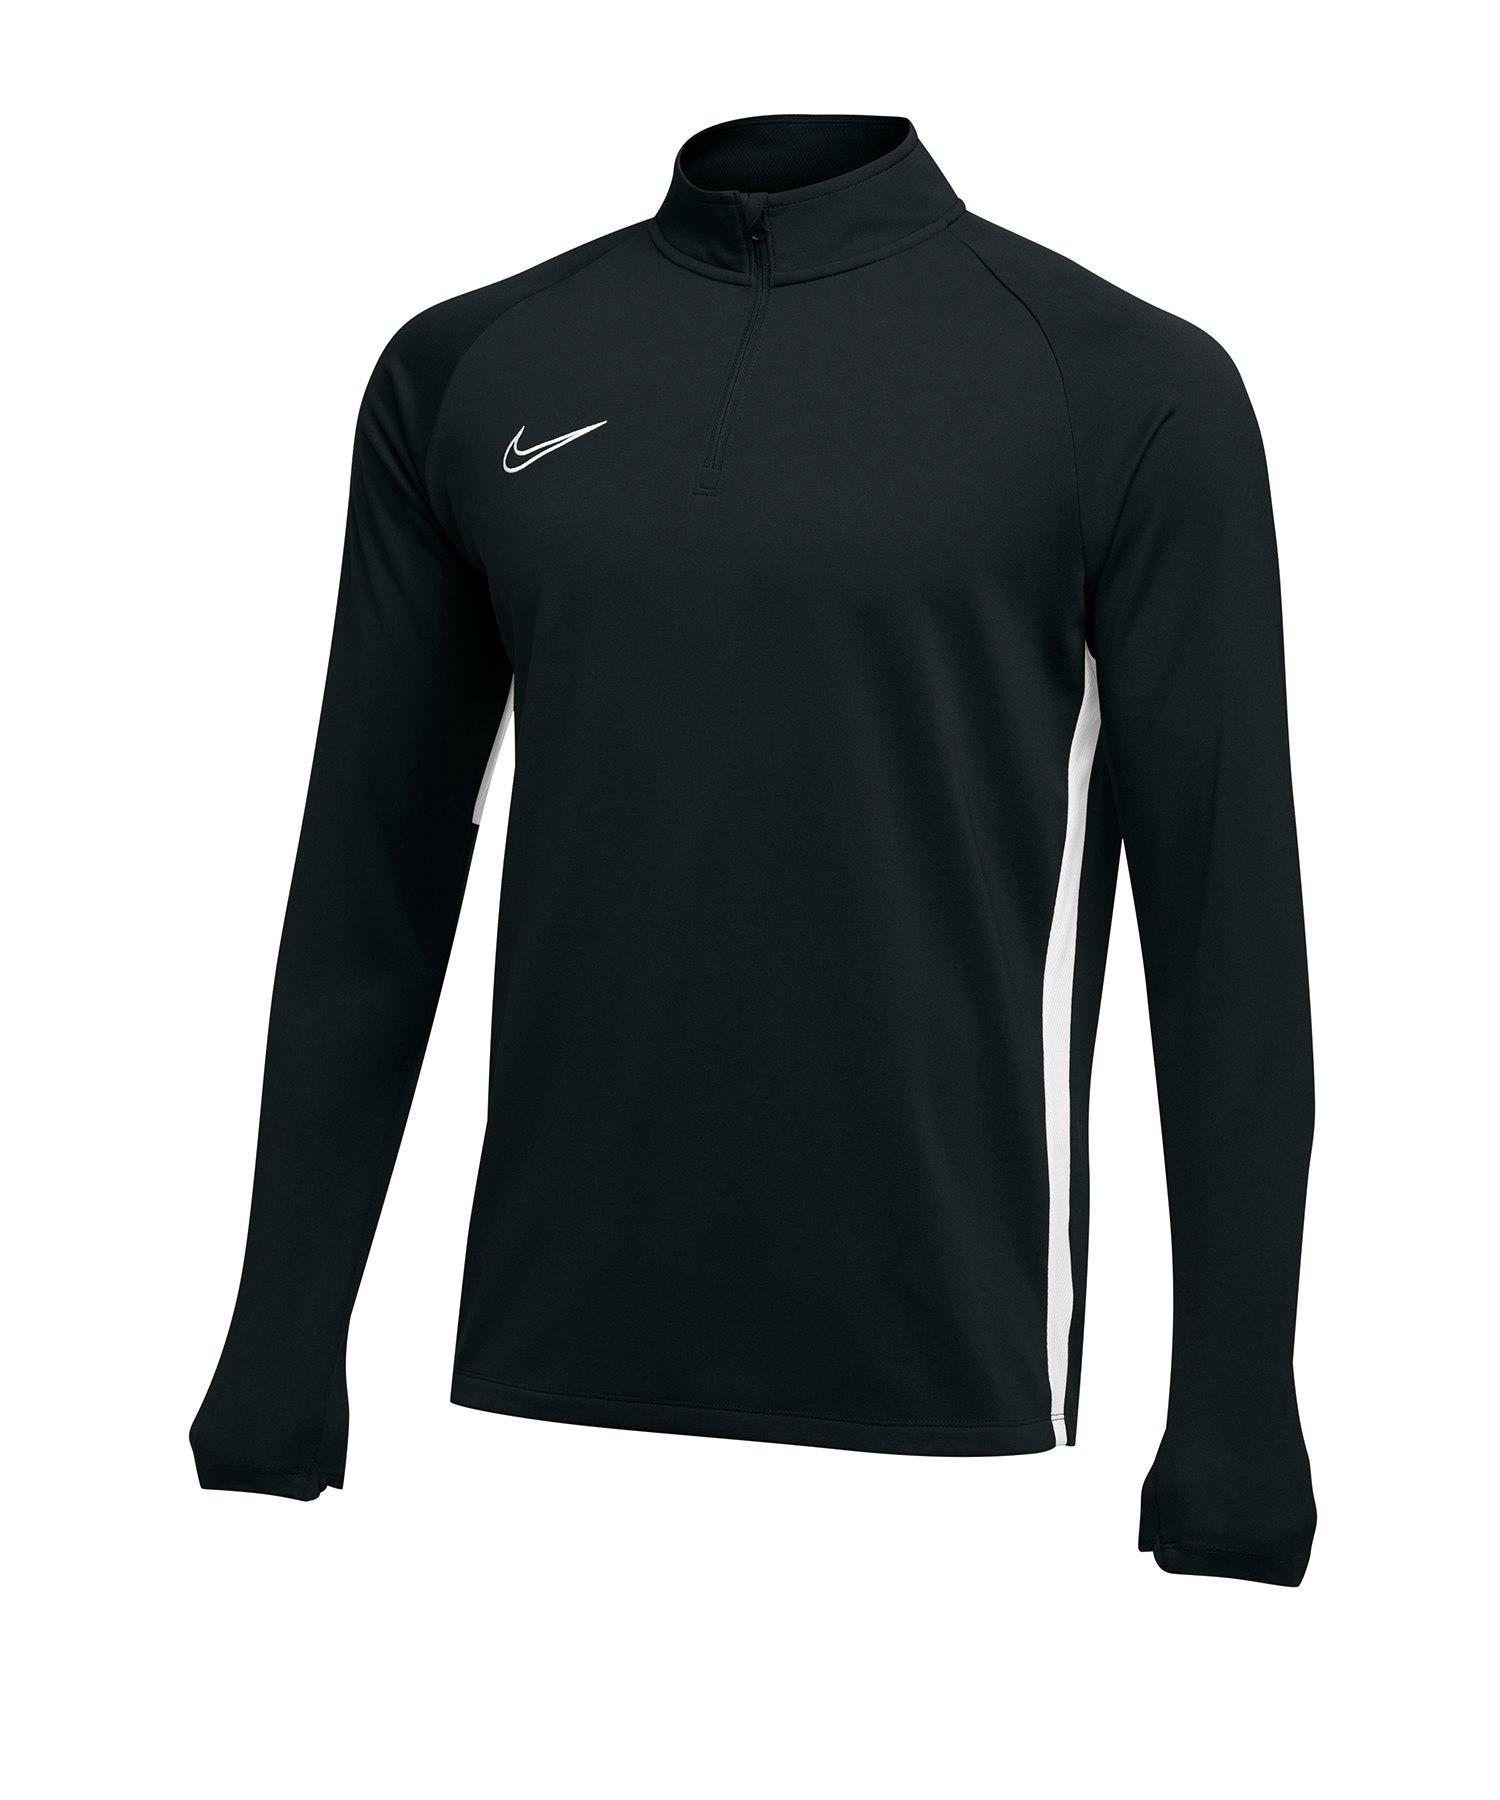 Nike Academy 19 1/4 Zip Drill Top Schwarz F010 - schwarz